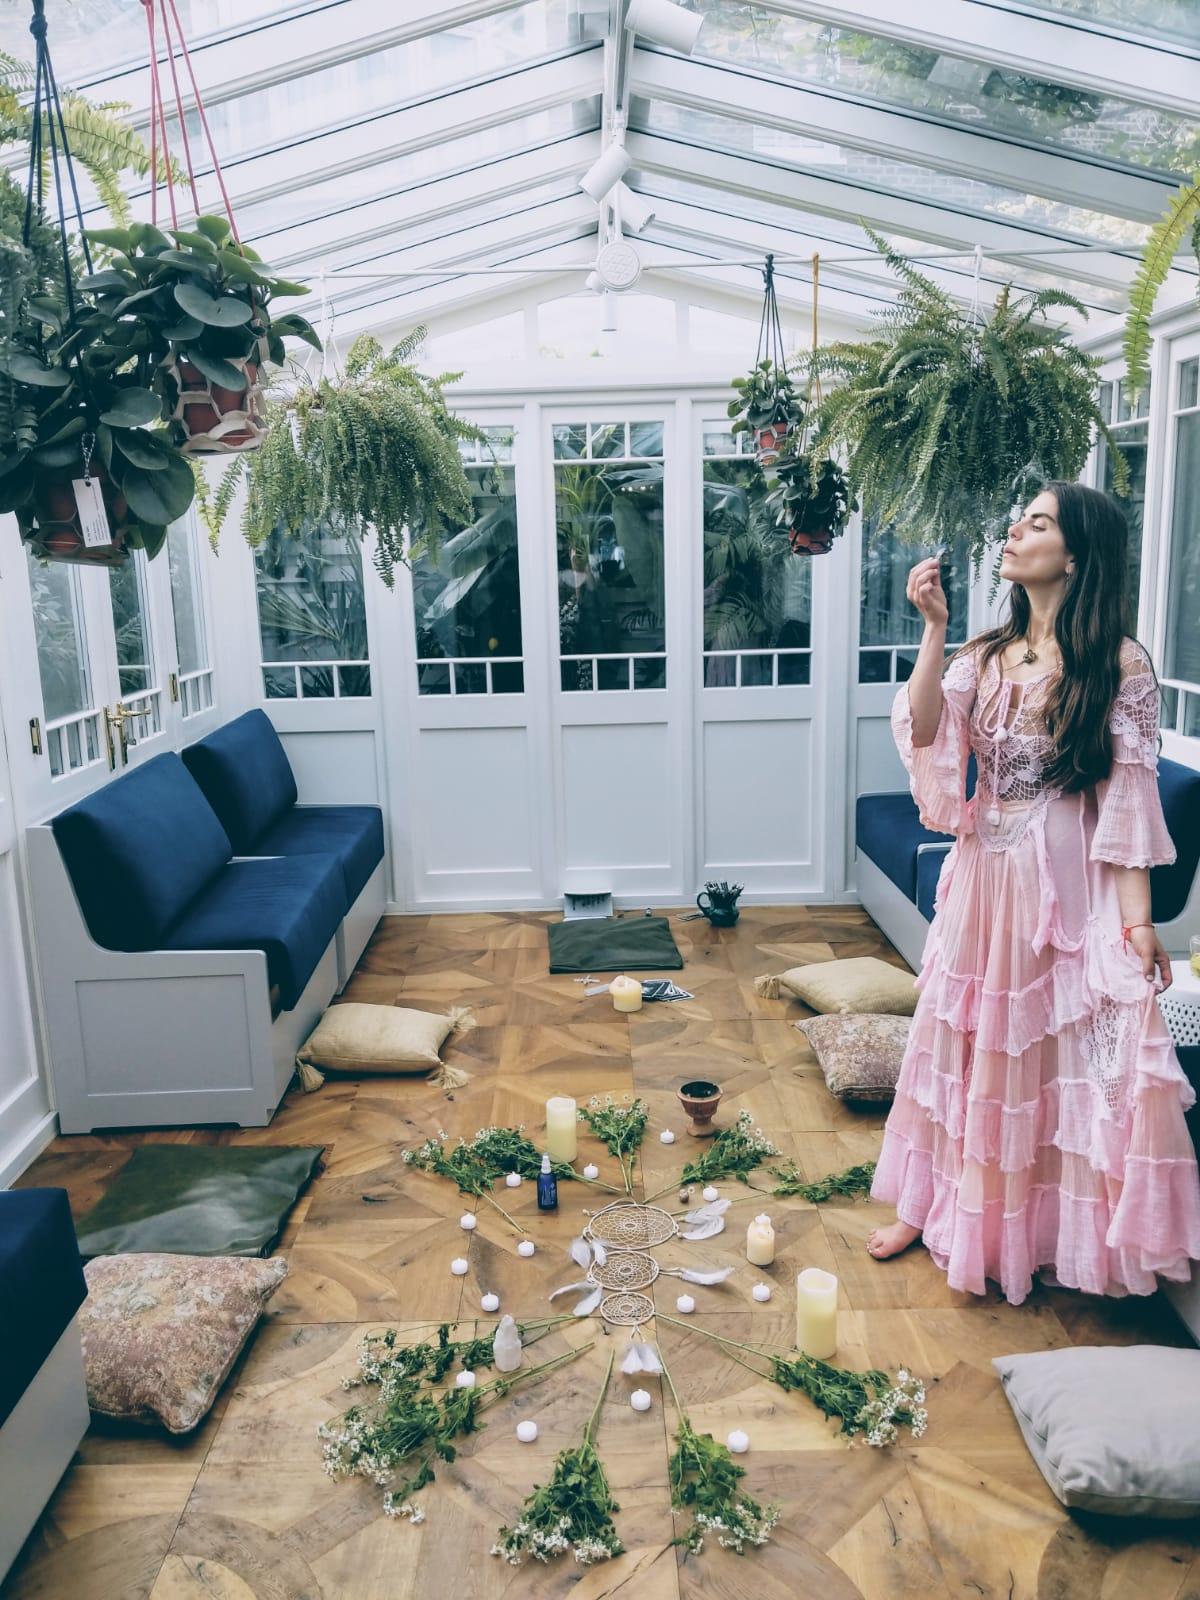 Anoushka Florence, founder of The Goddess Space at Gazelli House South Kensington